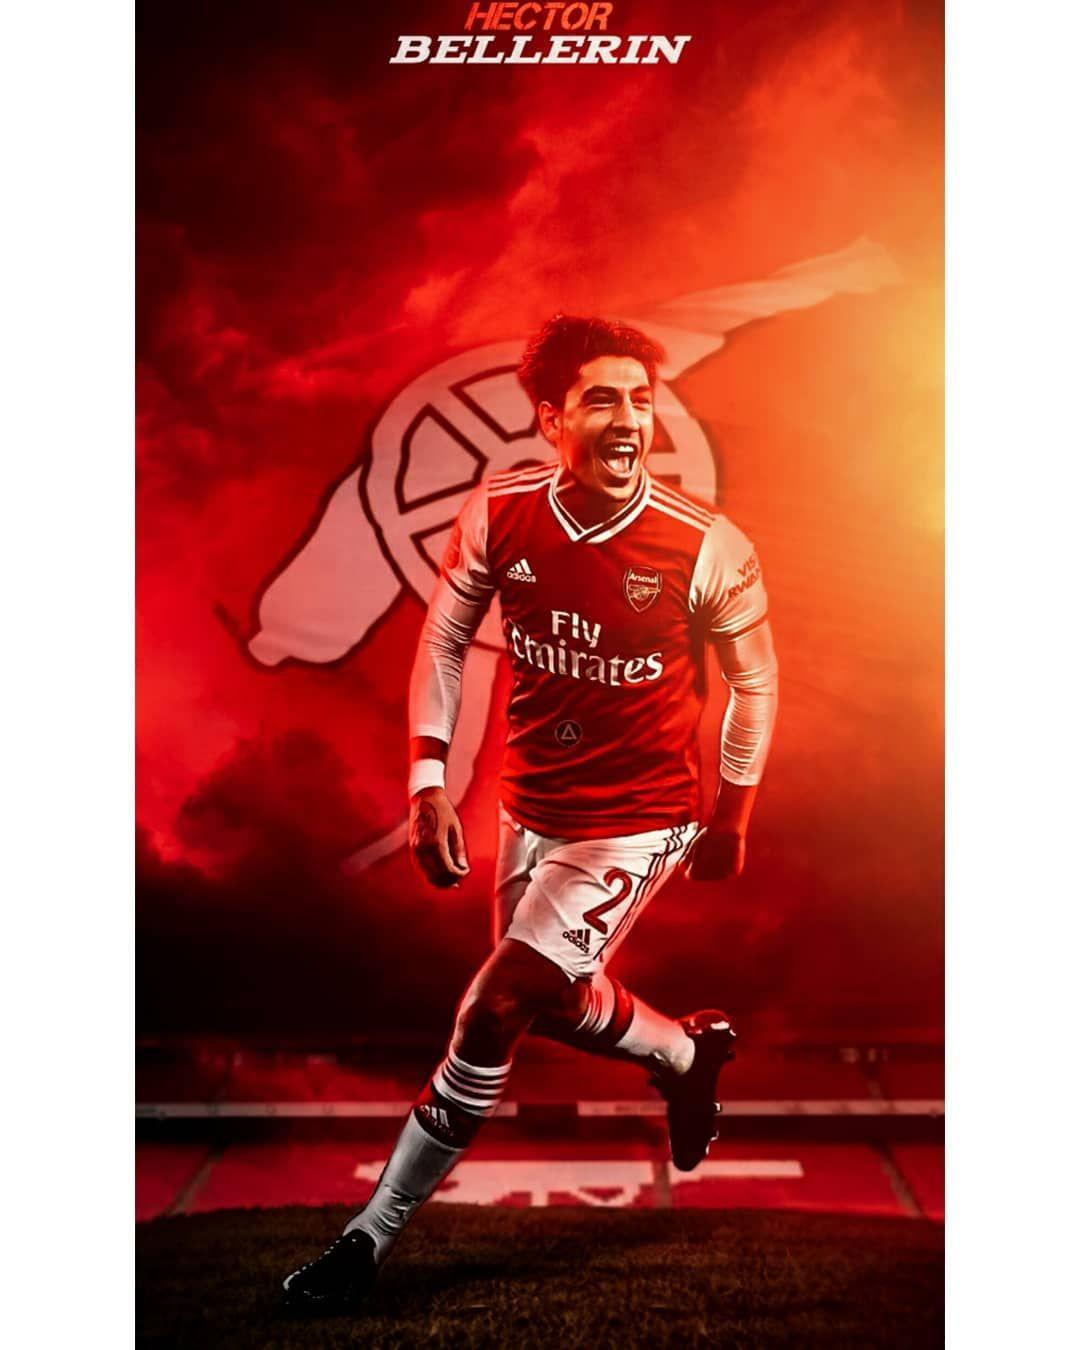 The Idol Hector Bellerin Is Back Wallpaper Picture Poster Design Sport Soccer Football Futbol Arsenal Hector Bellerin Sport Photography Hector